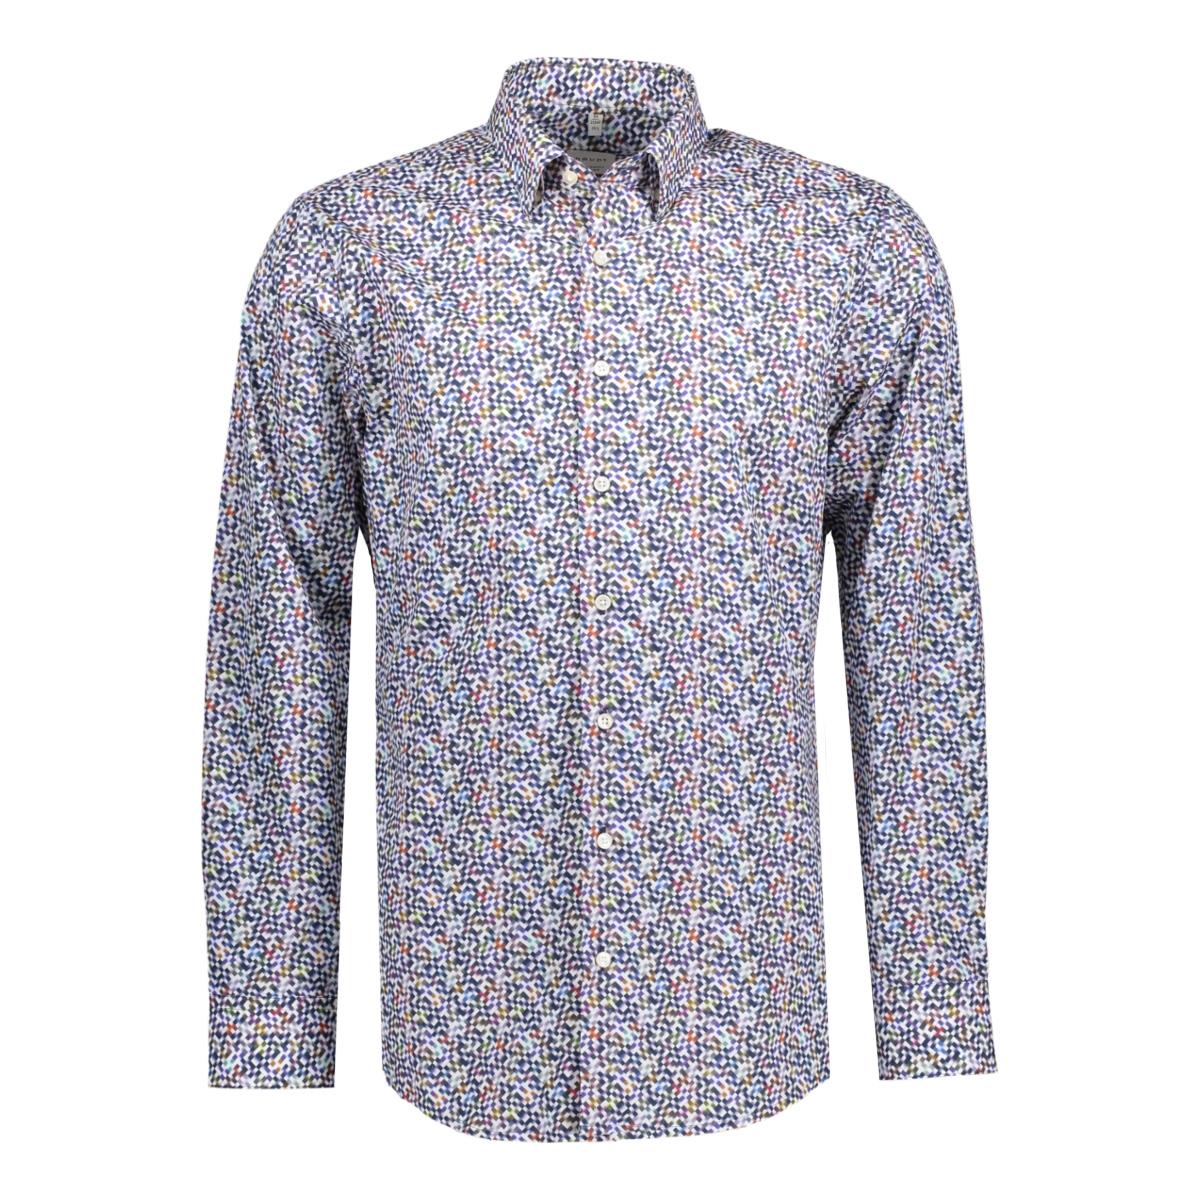 3371 7146 haupt overhemd 01